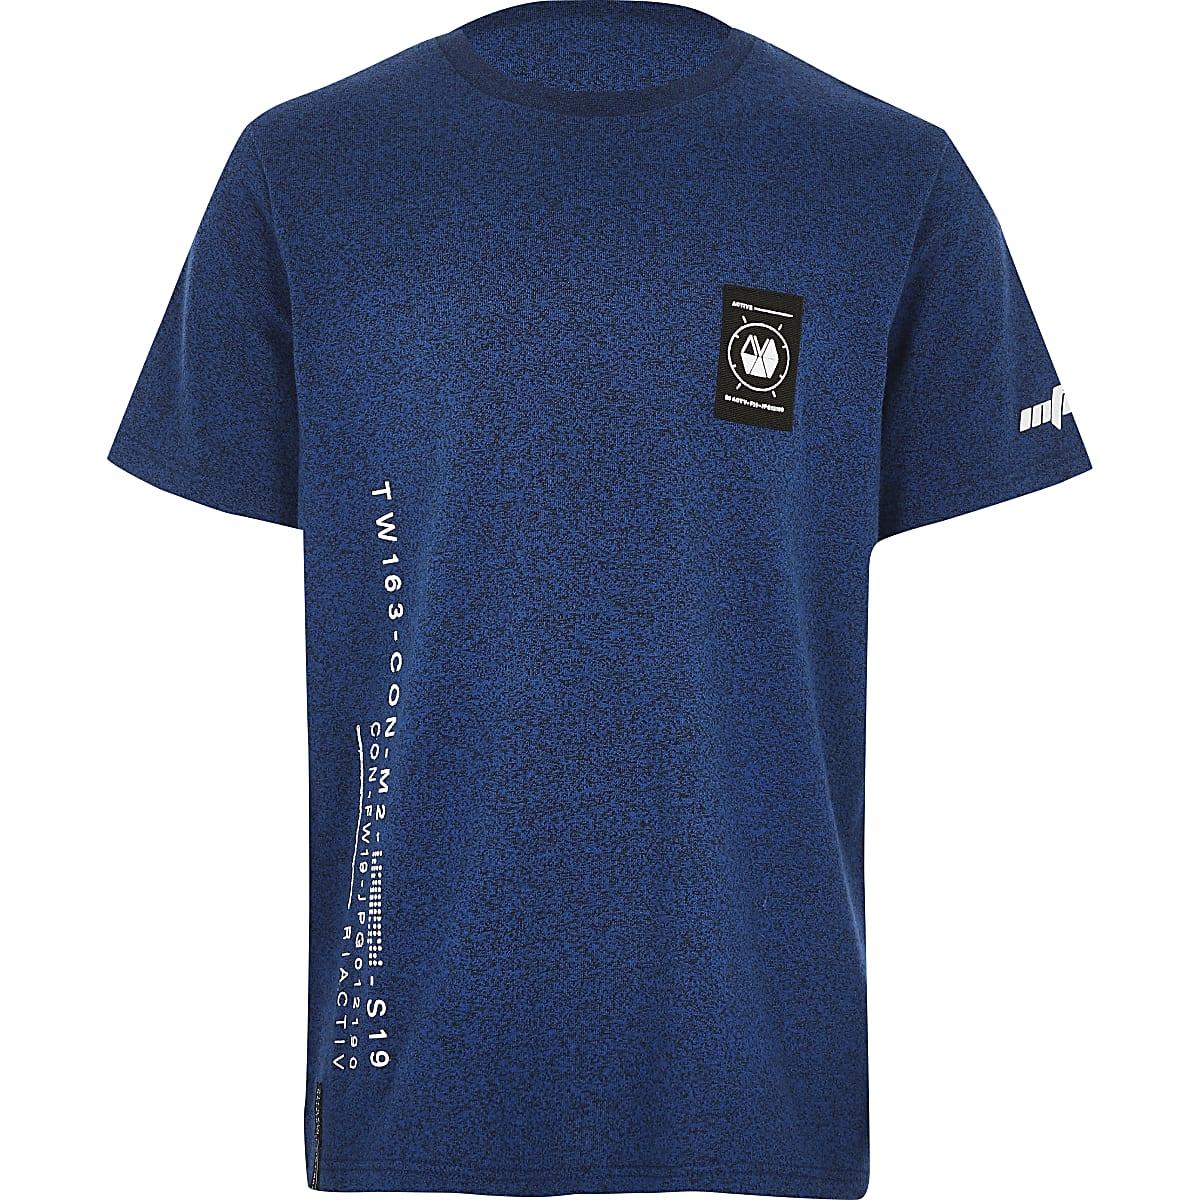 Garçon – RI Active – T-shirt  imprimébleu